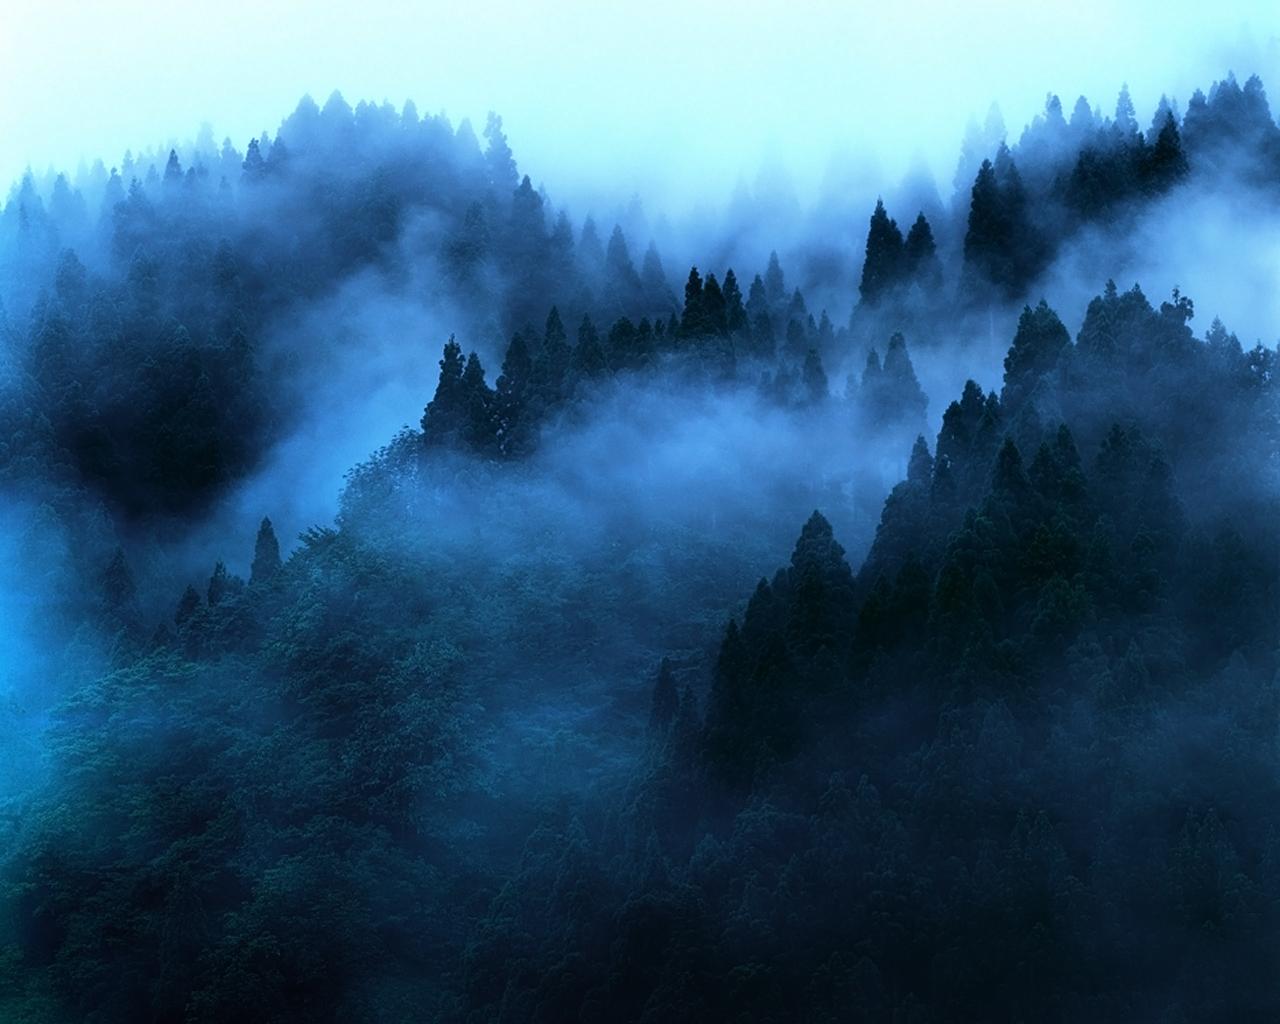 Cute Rustic Fall Wallpapers Mist Wallpaper Mountains Hd Desktop Wallpapers 4k Hd